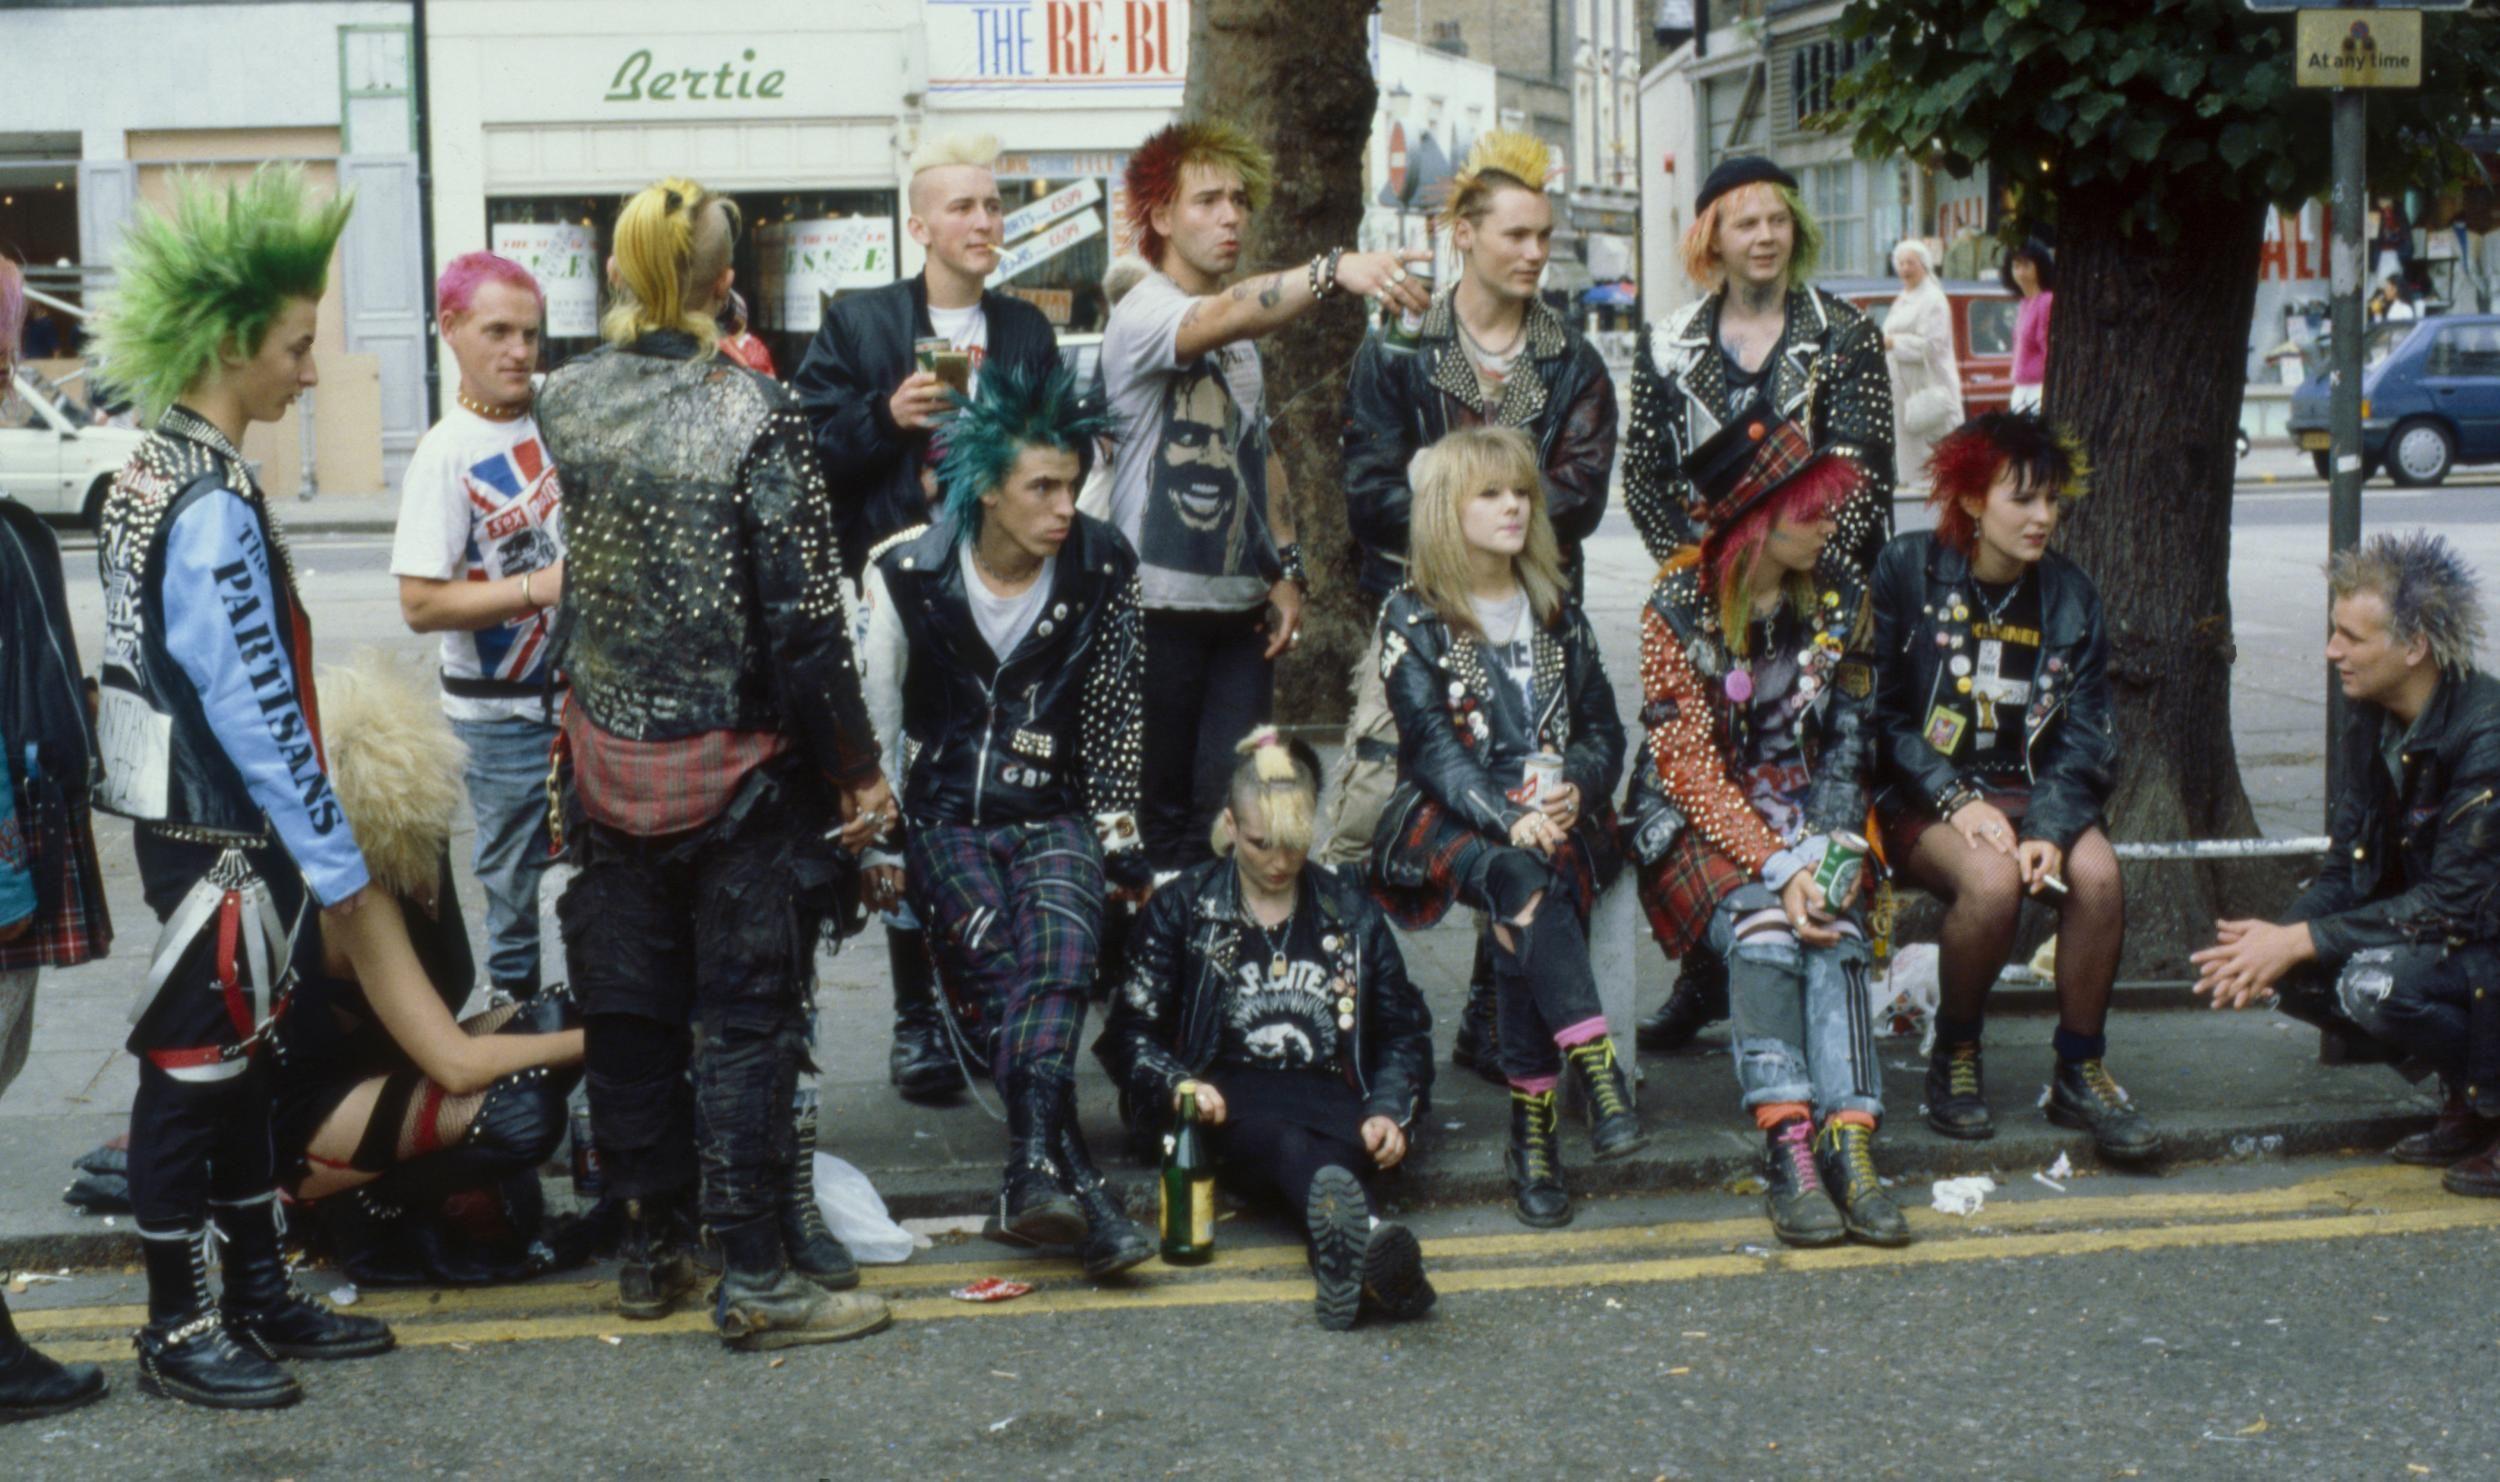 https://duckduckgo.com/?q=UK punks